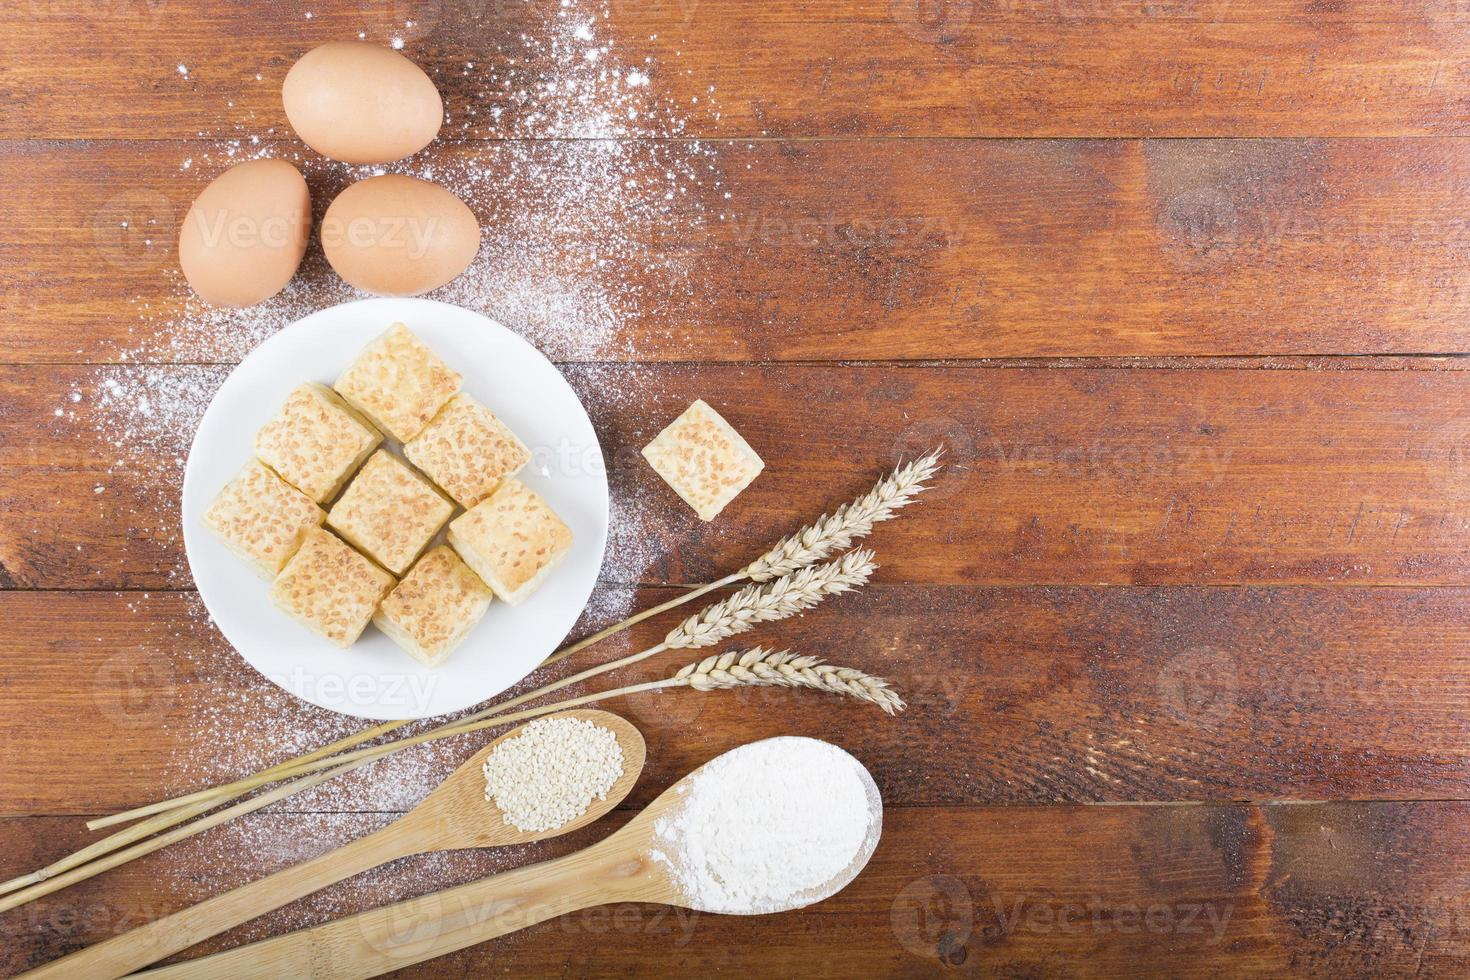 Recipe ingredients and kitchen photo